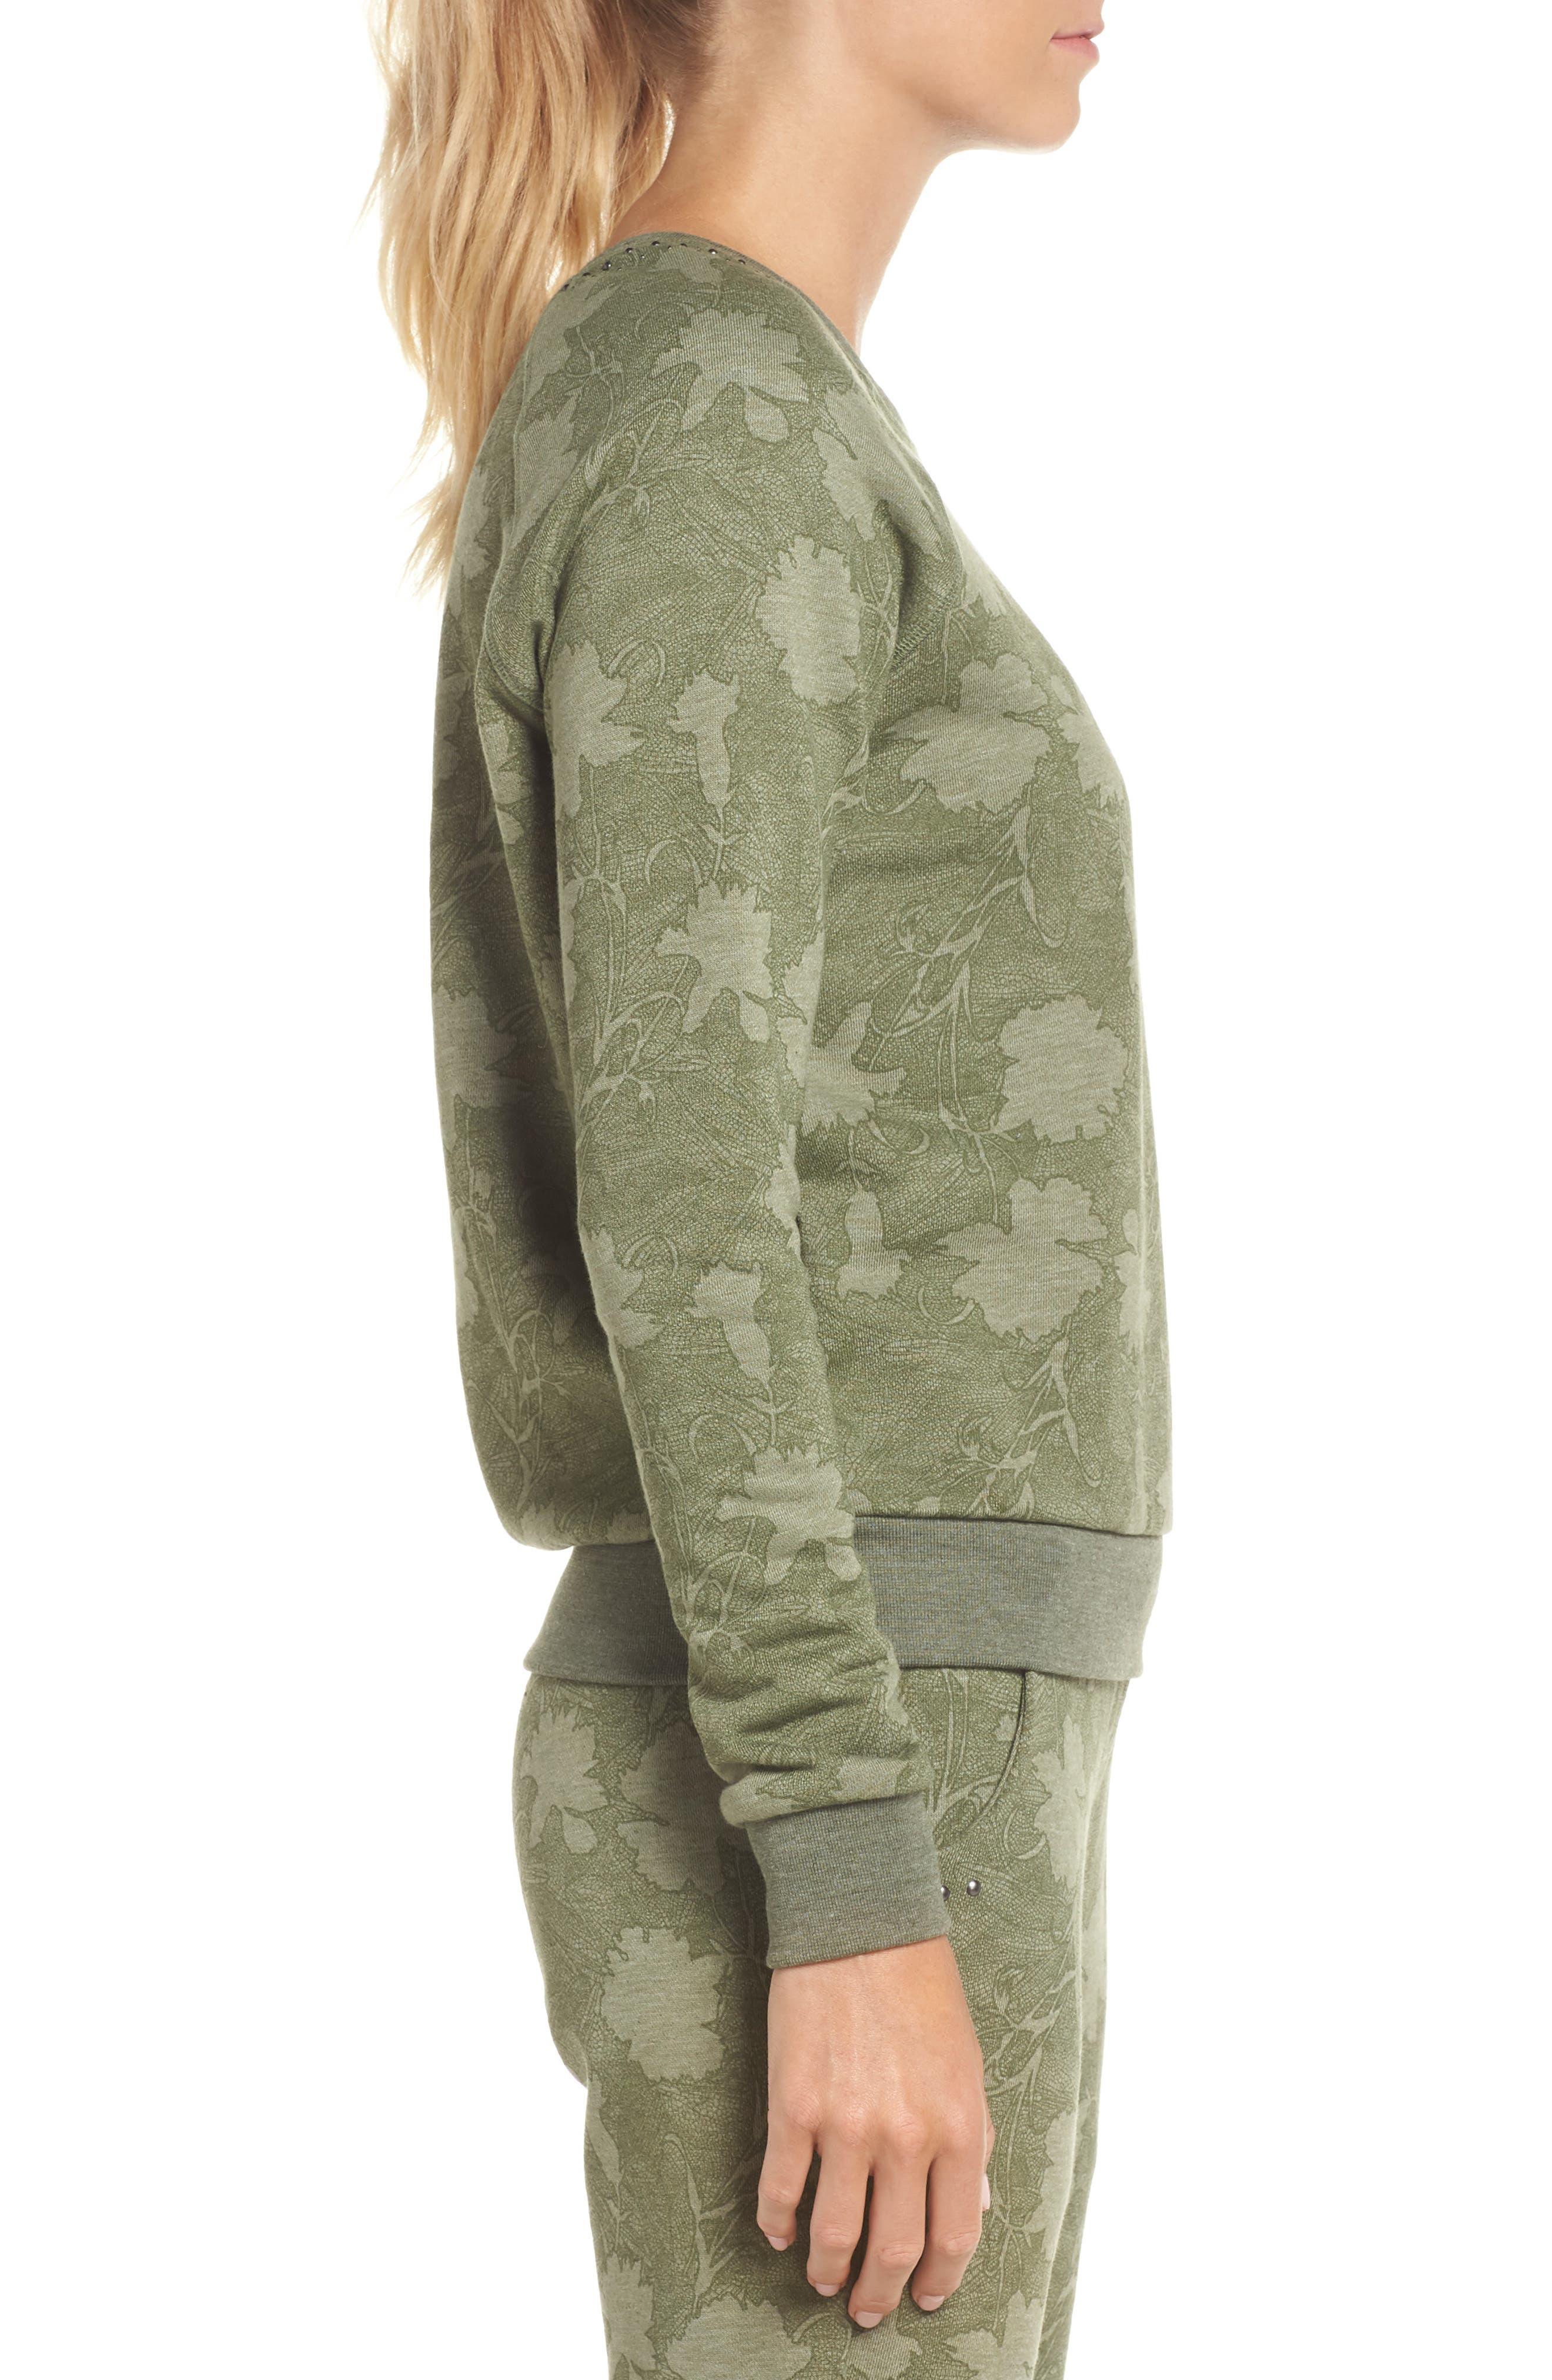 Sleek Leaf Kale Sweatshirt,                             Alternate thumbnail 3, color,                             GREEN